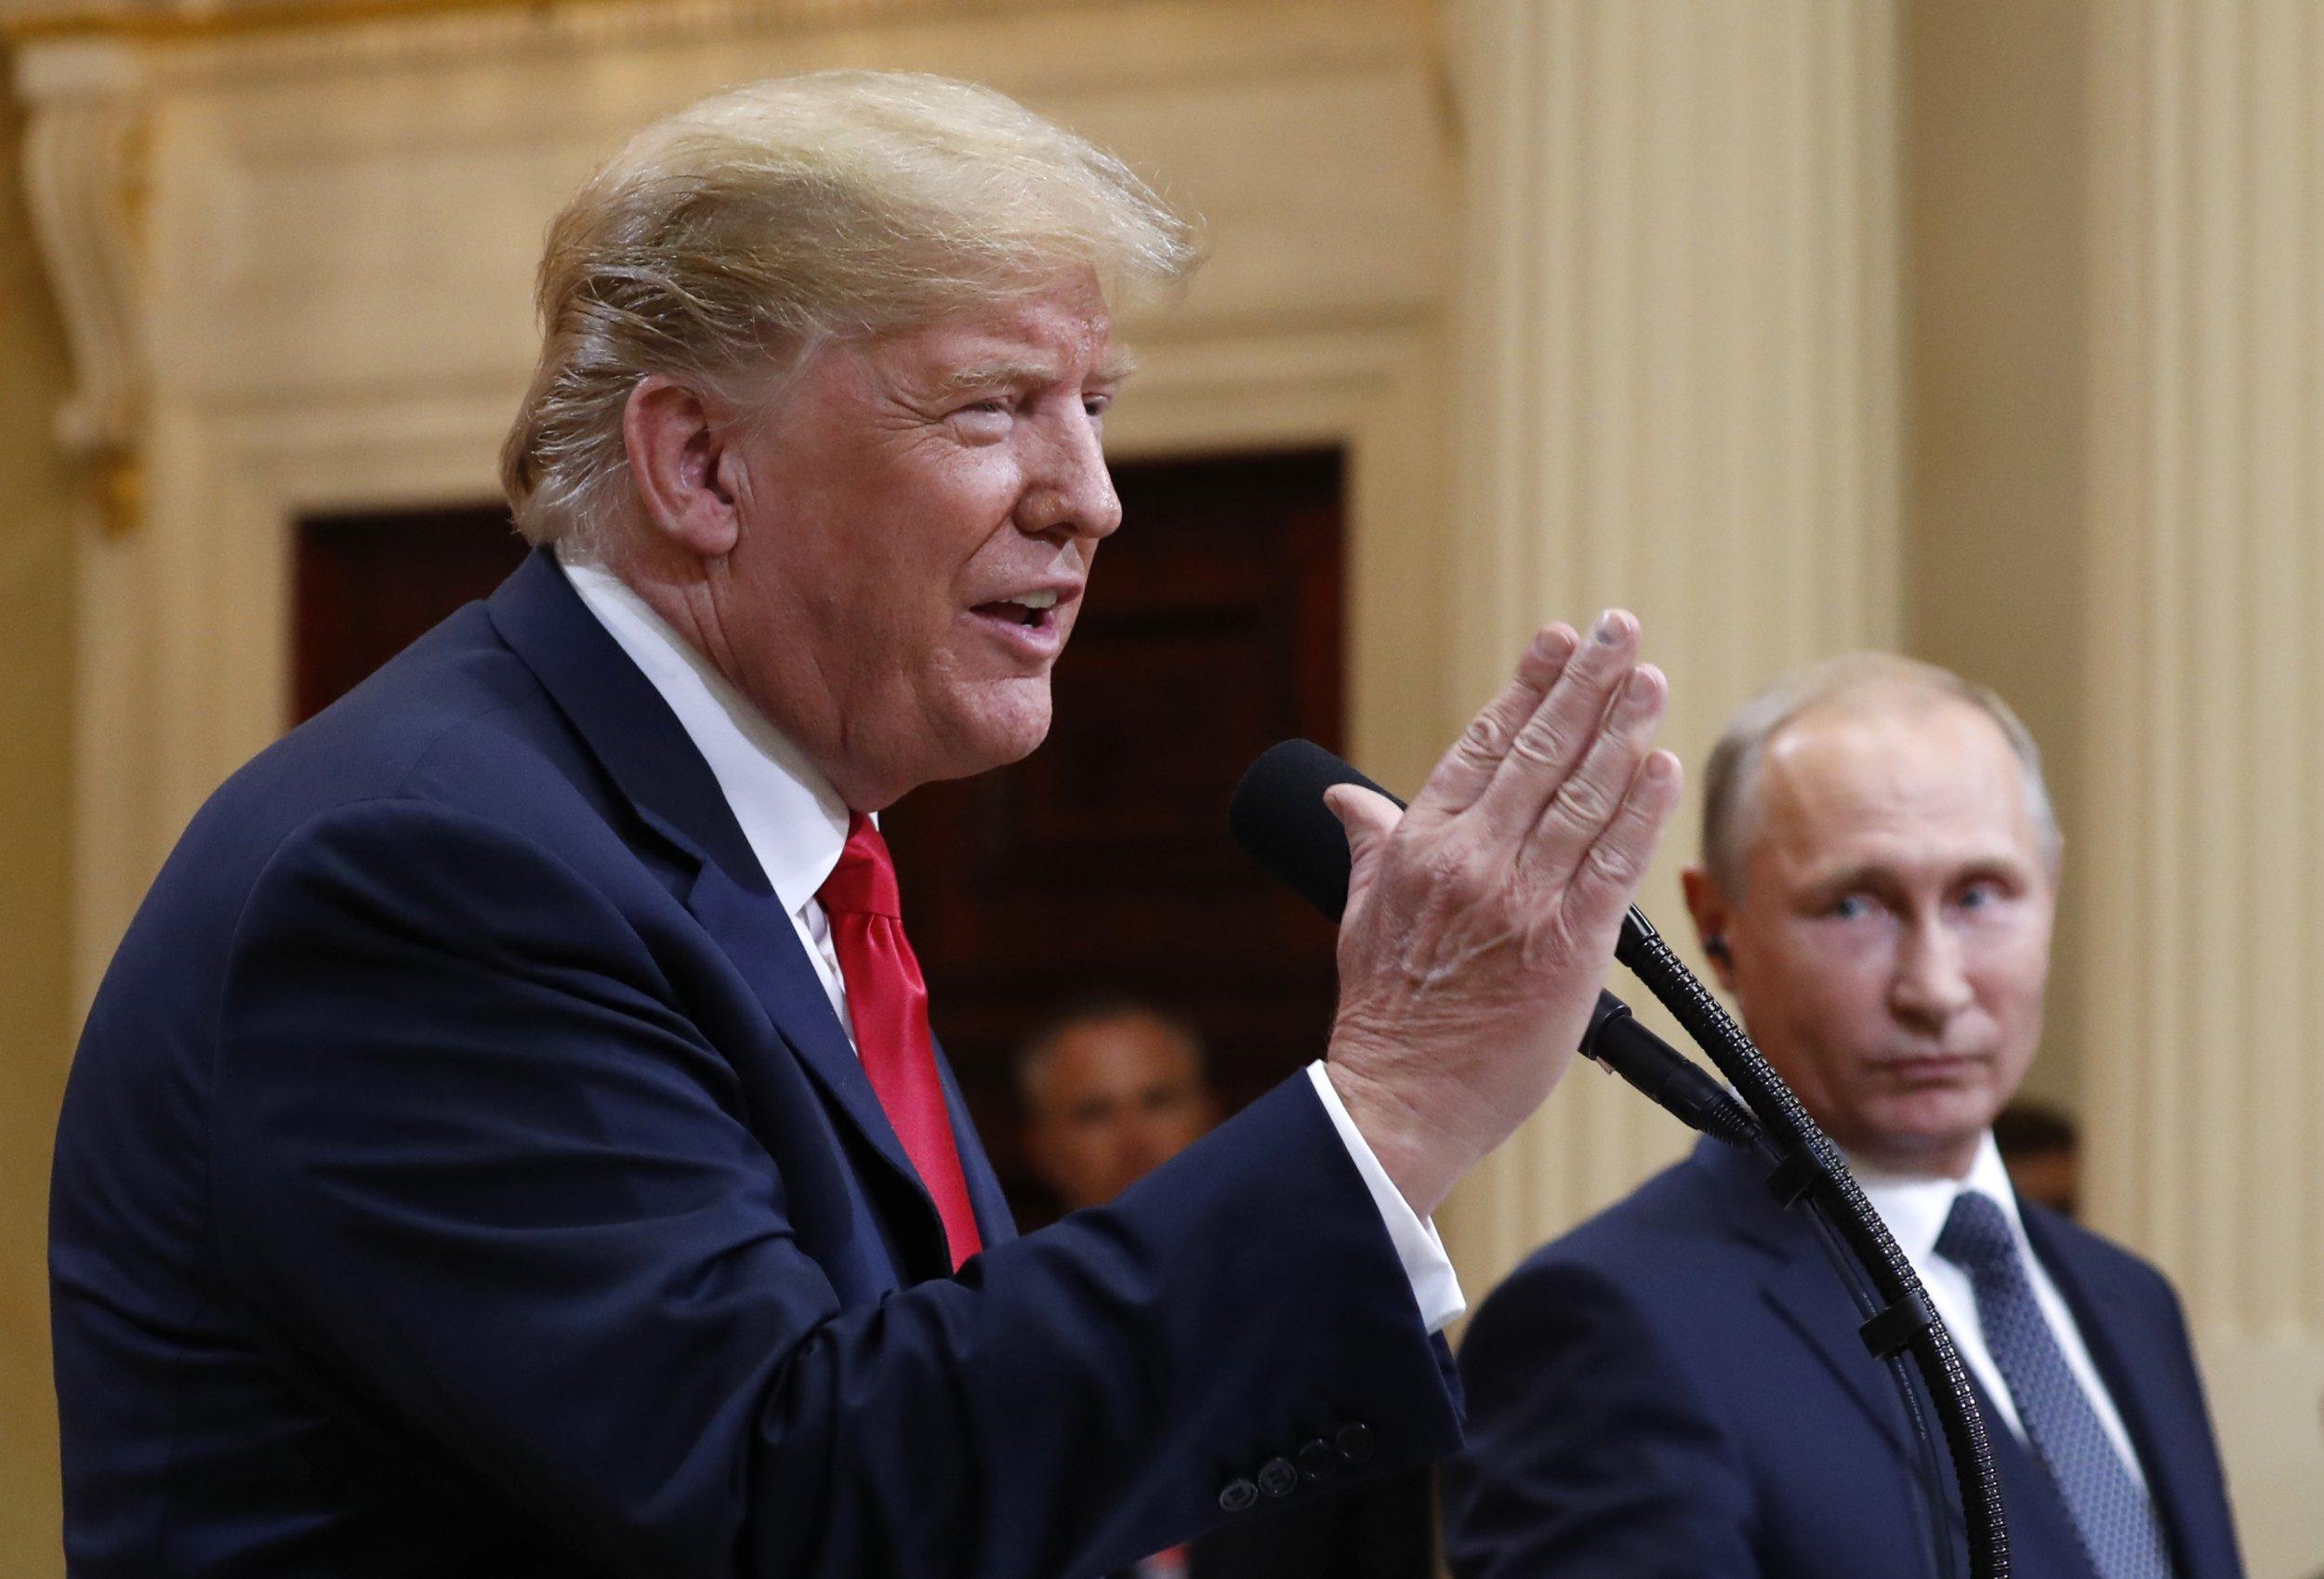 Trump calls negative coverage of his Putin meeting 'fake news'